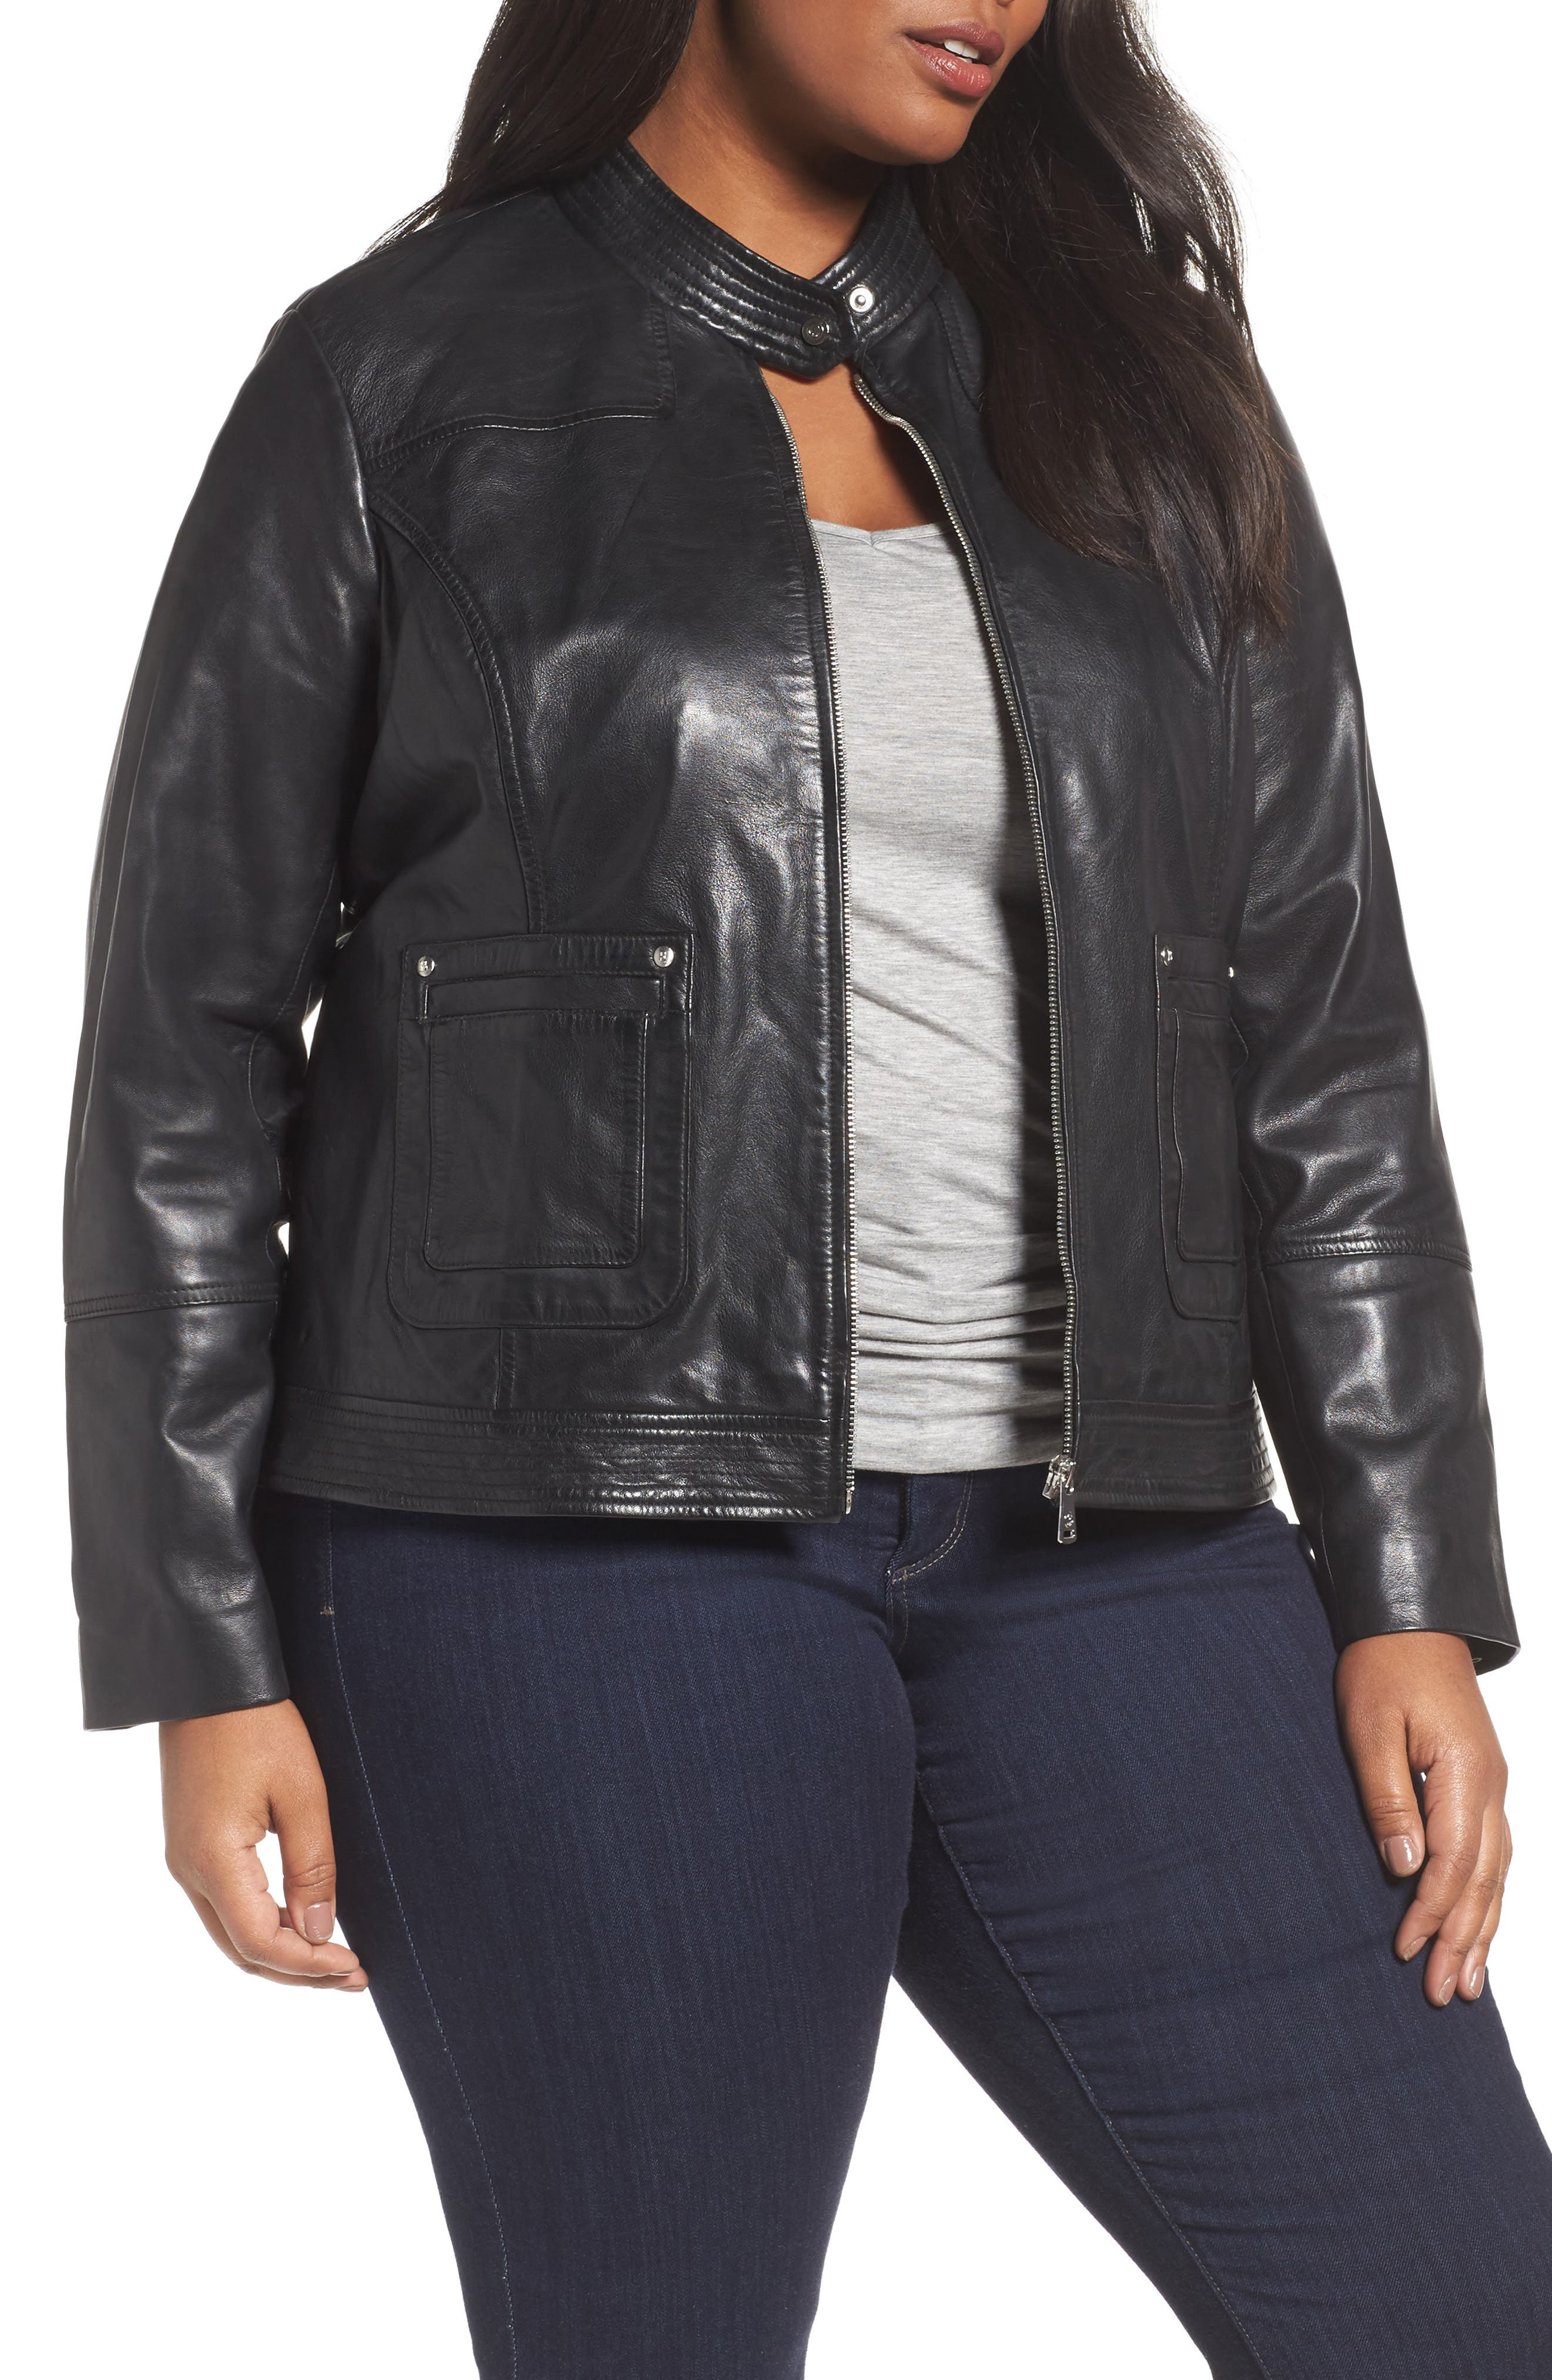 Kirwin Sheepskin Leather Jacket,                             Main thumbnail 1, color,                             001